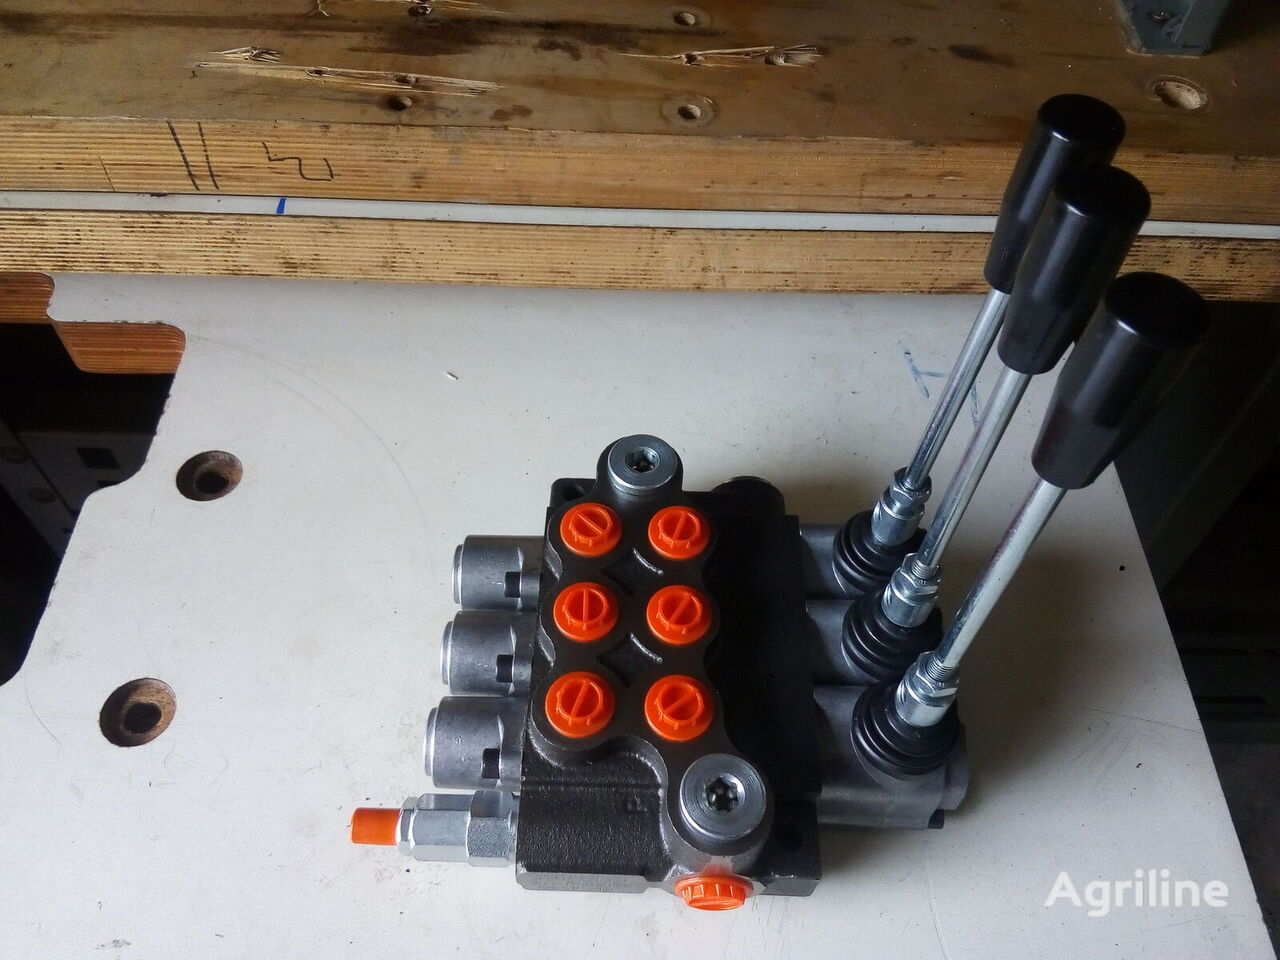 new MTZ 3r80 (3P80 1A1A1A1GKZ1) hydraulic distributor for MTZ tractor